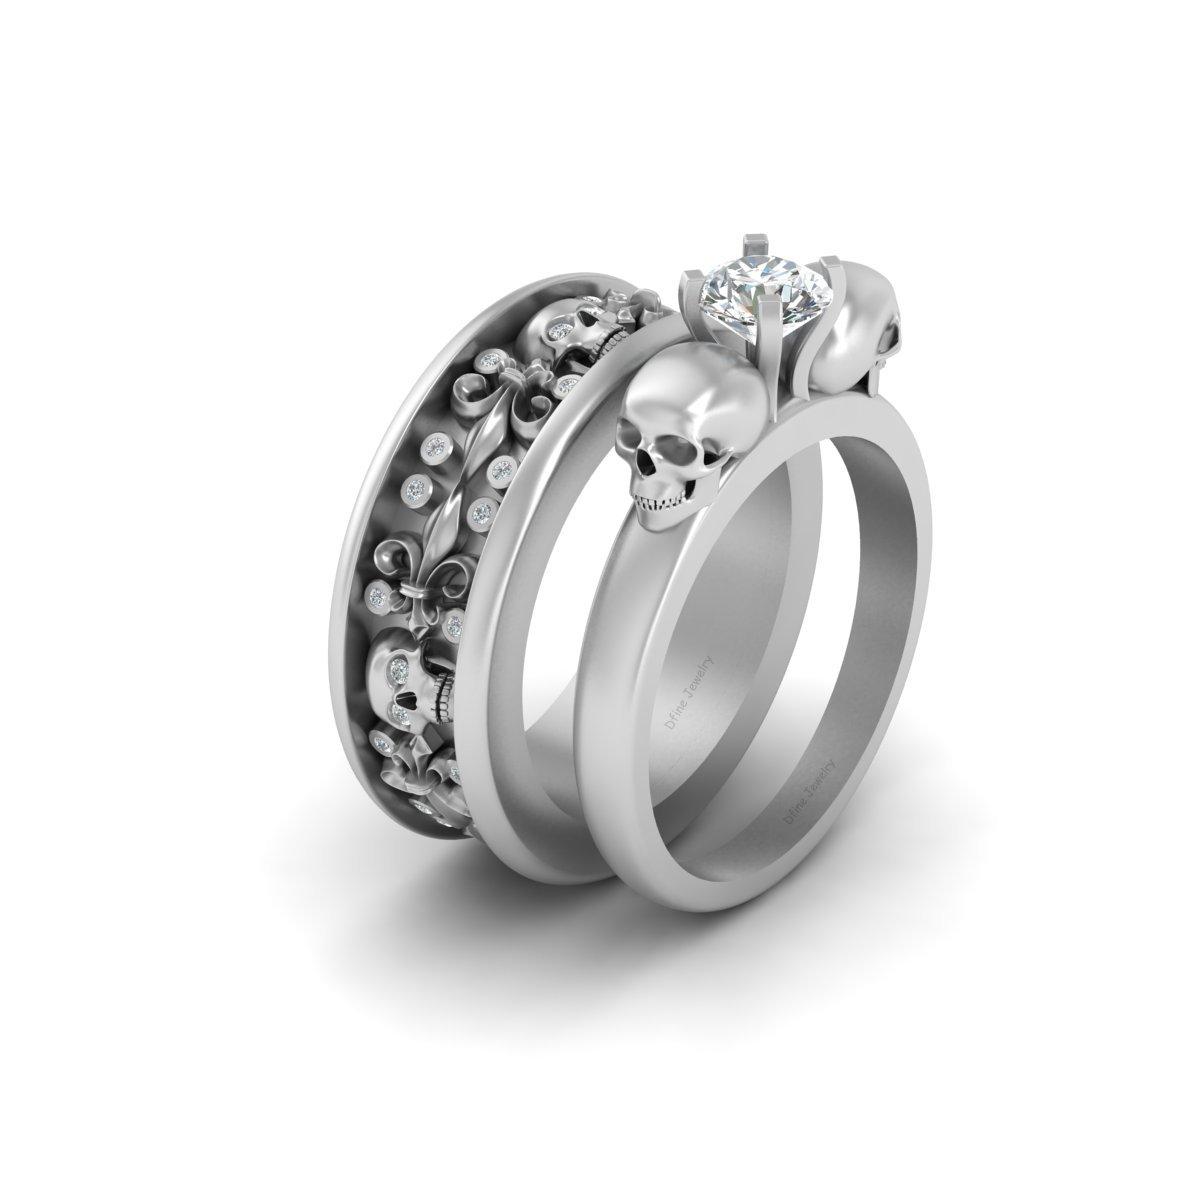 Skull Wedding Band Ring Set Dfine Jewelry Store